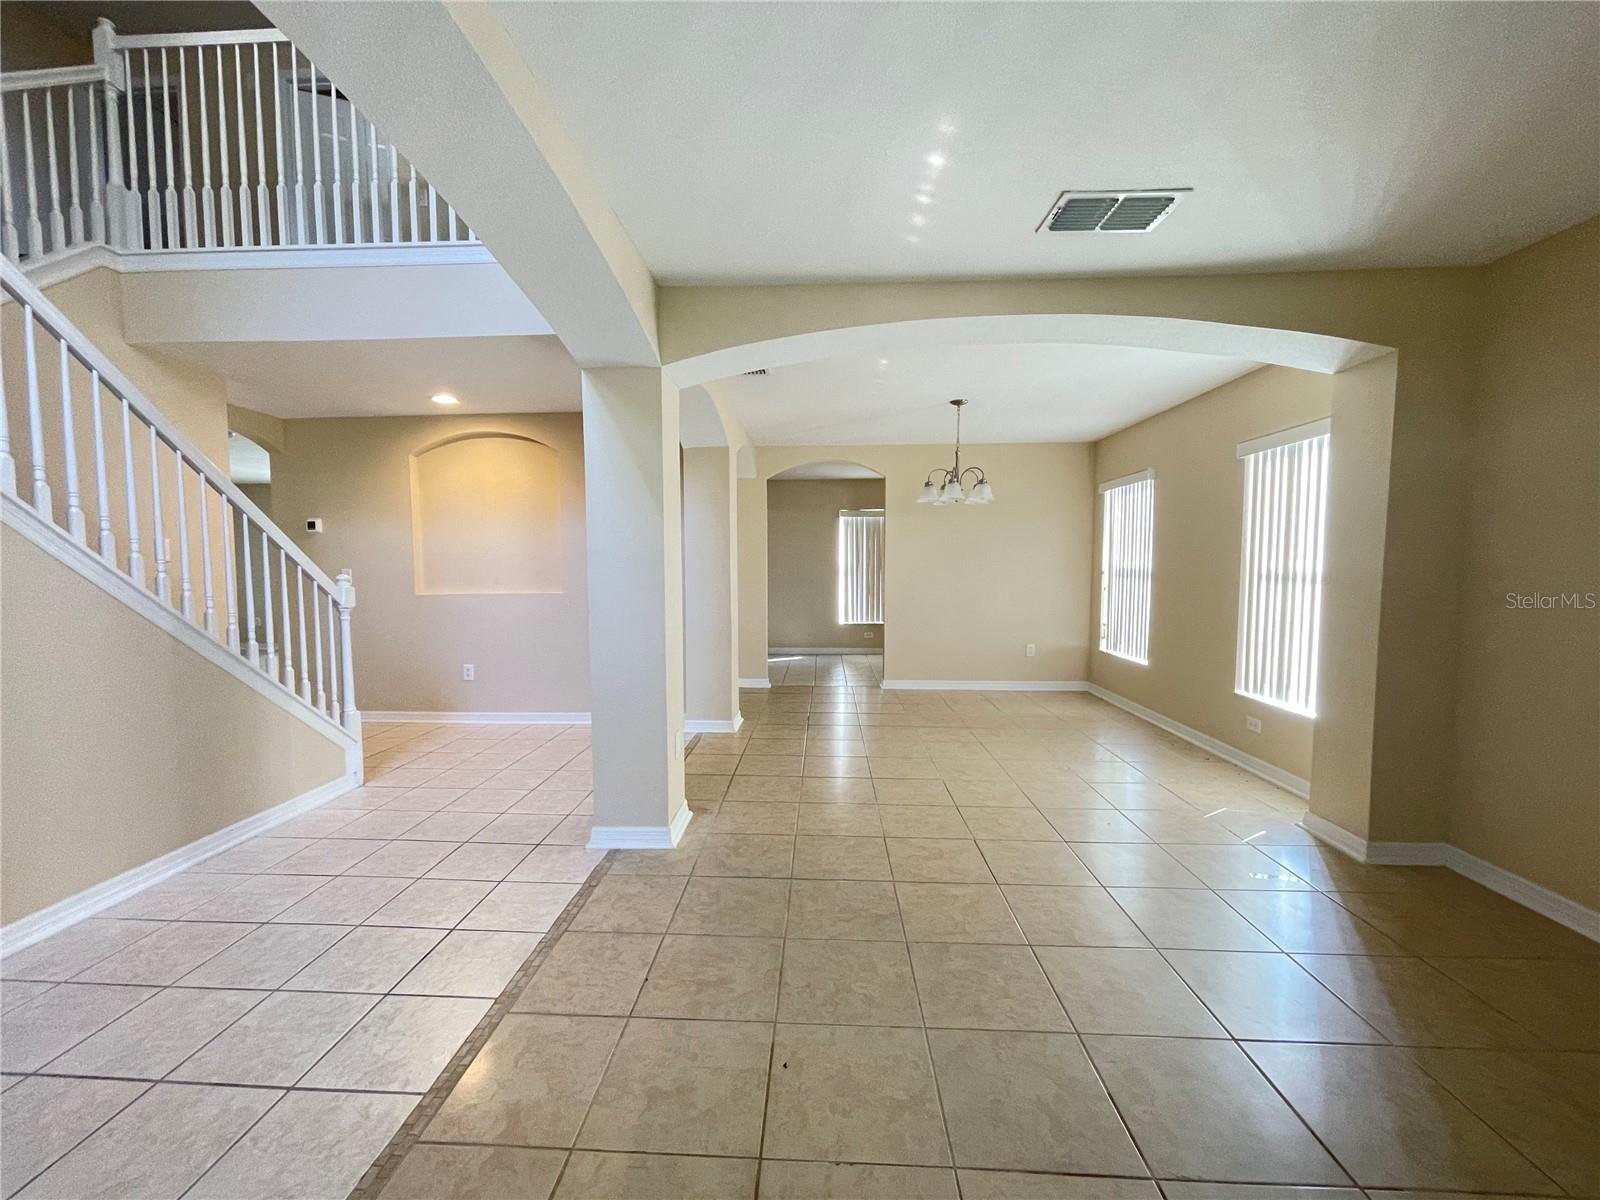 Photo of 642 CHADBURY WAY, KISSIMMEE, FL 34744 (MLS # S5056908)